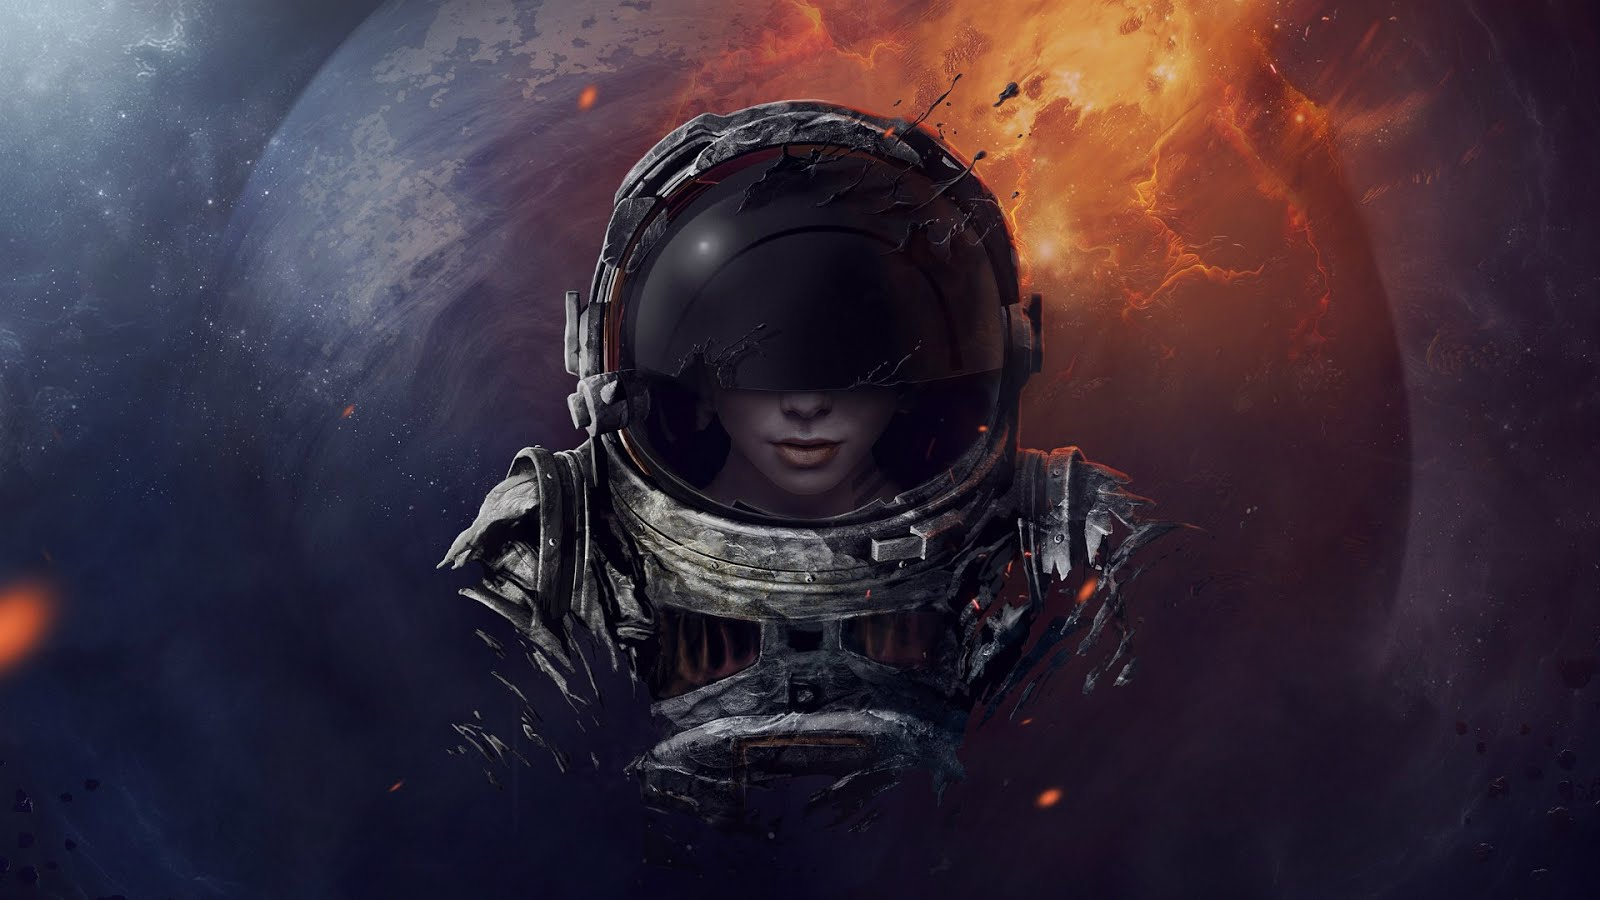 Space Girl Wallpaper